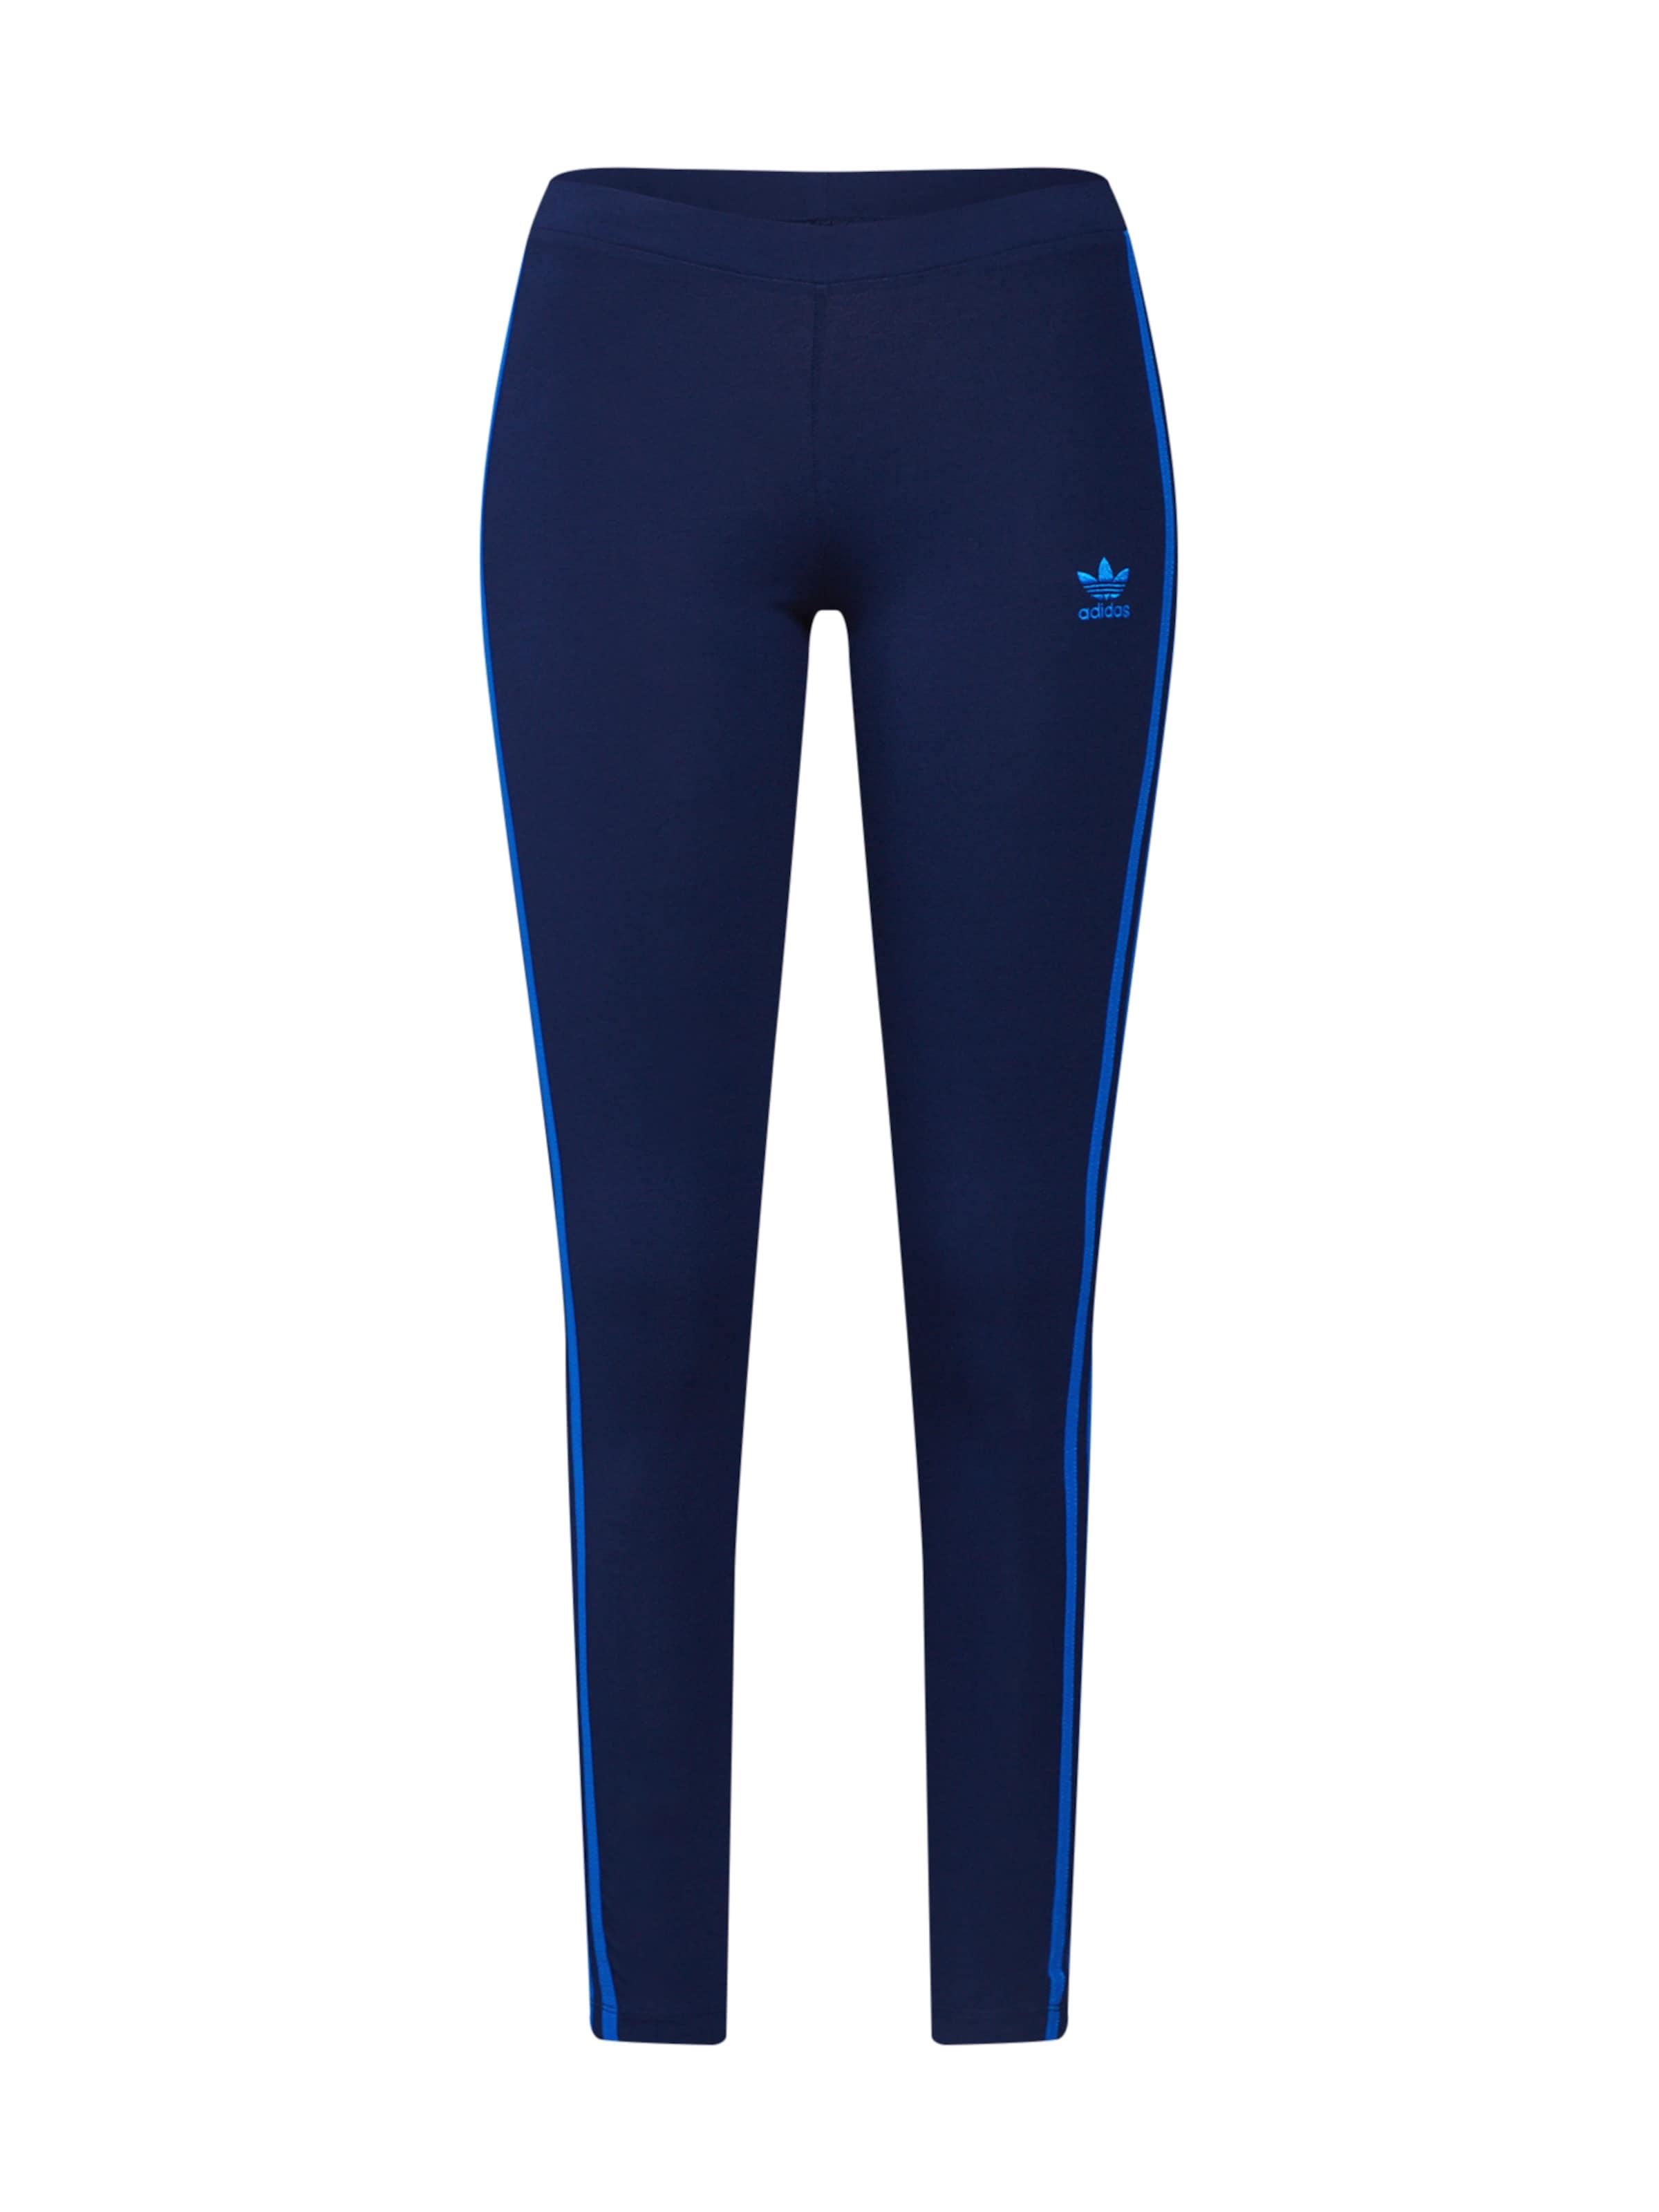 Navy Adidas Stripes' Leggings In '3 Originals CrxoedB